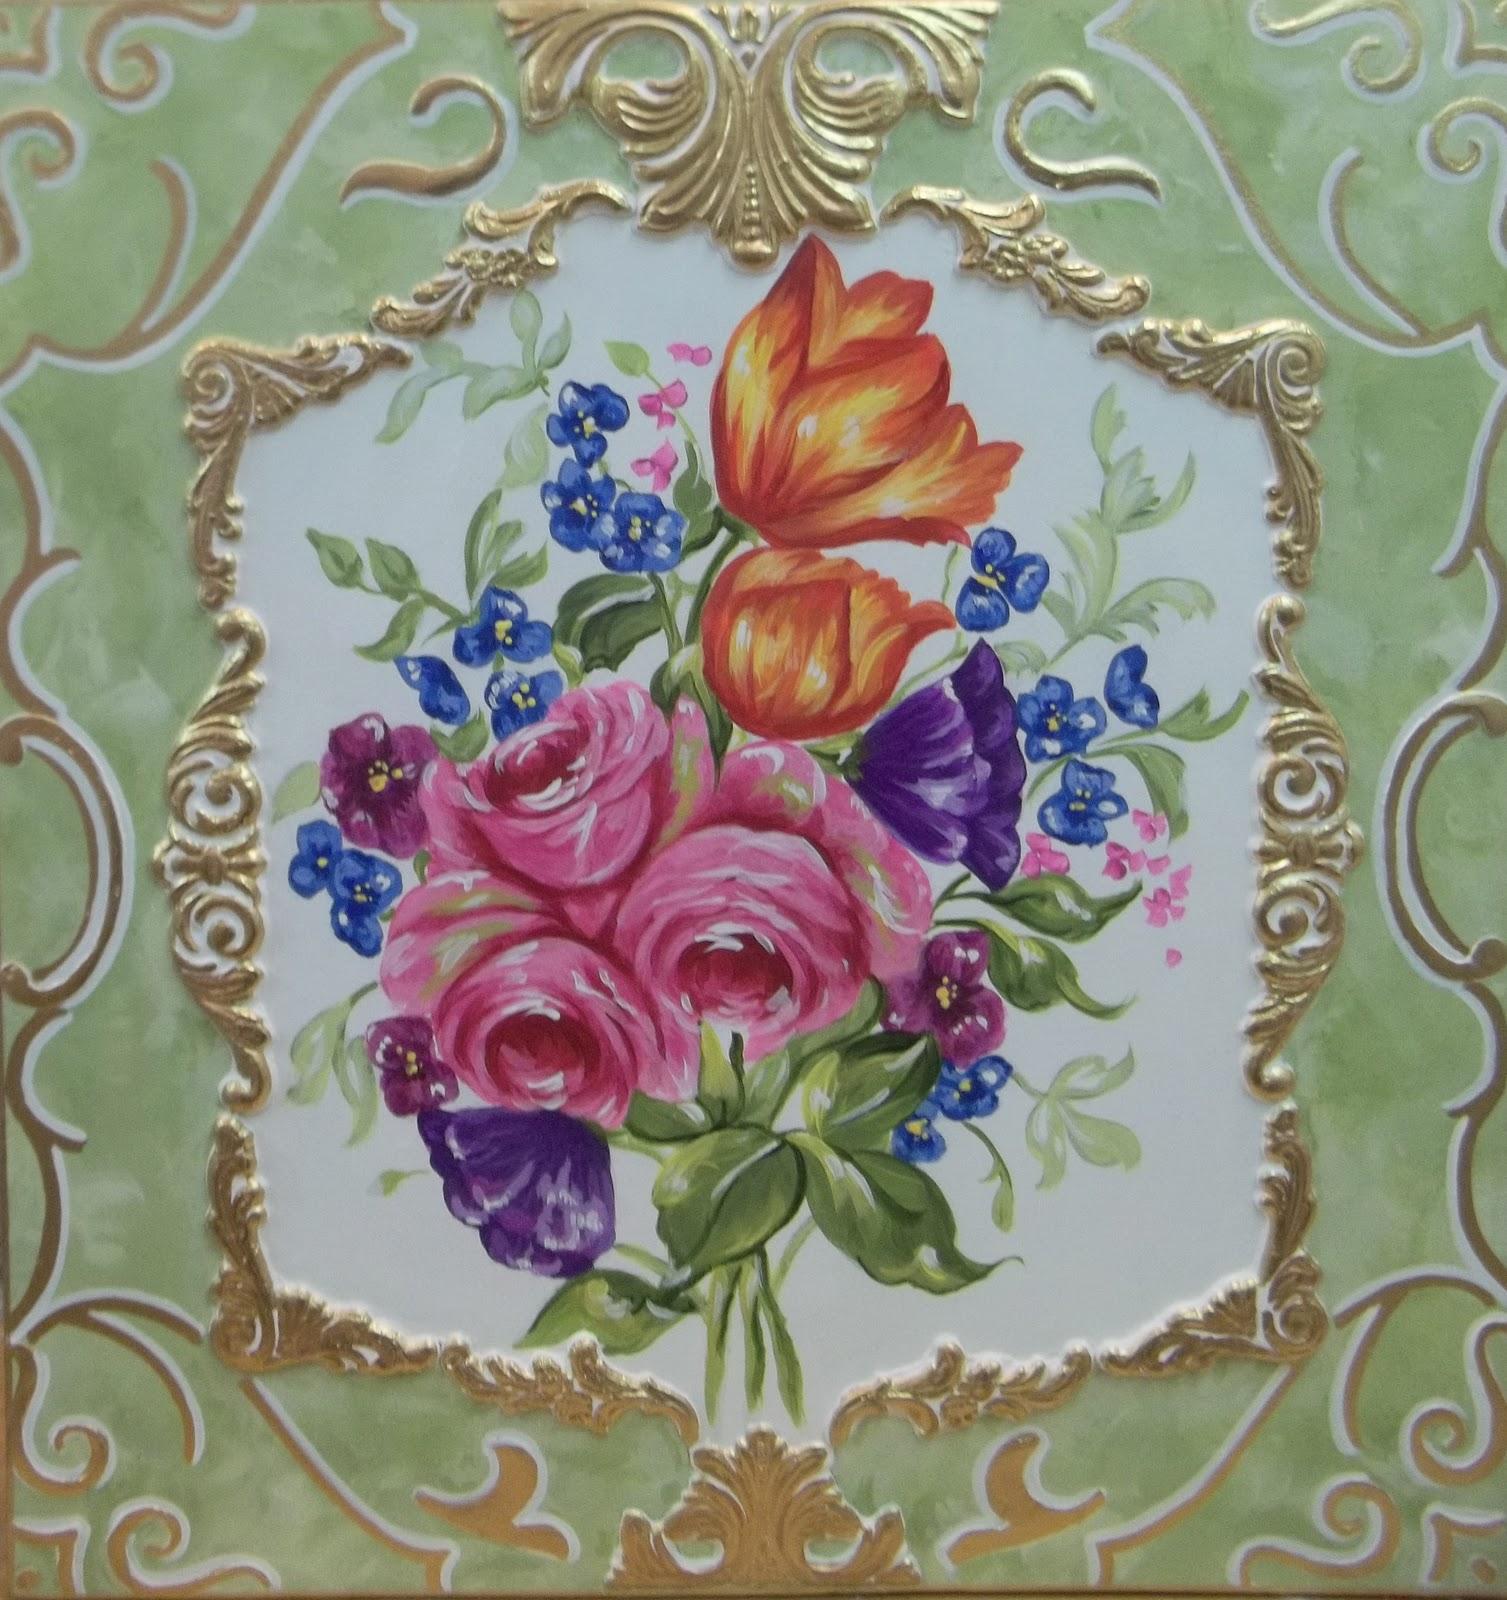 Jonny j petros royal rococo style ornamental decorative for Rococo decorative style